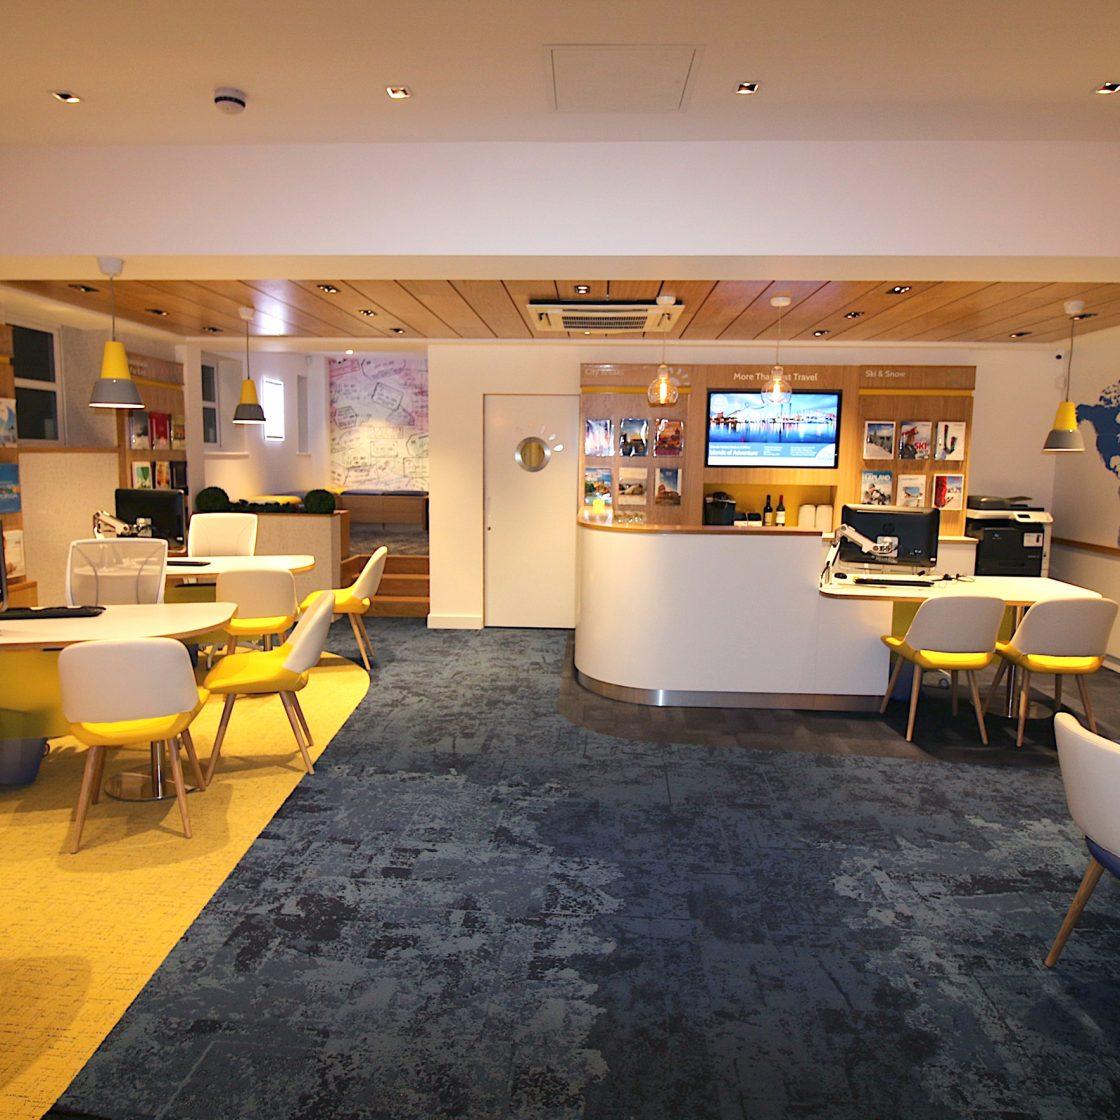 Go Travel_Chislhrust_Interior Design By Nugget Design 10